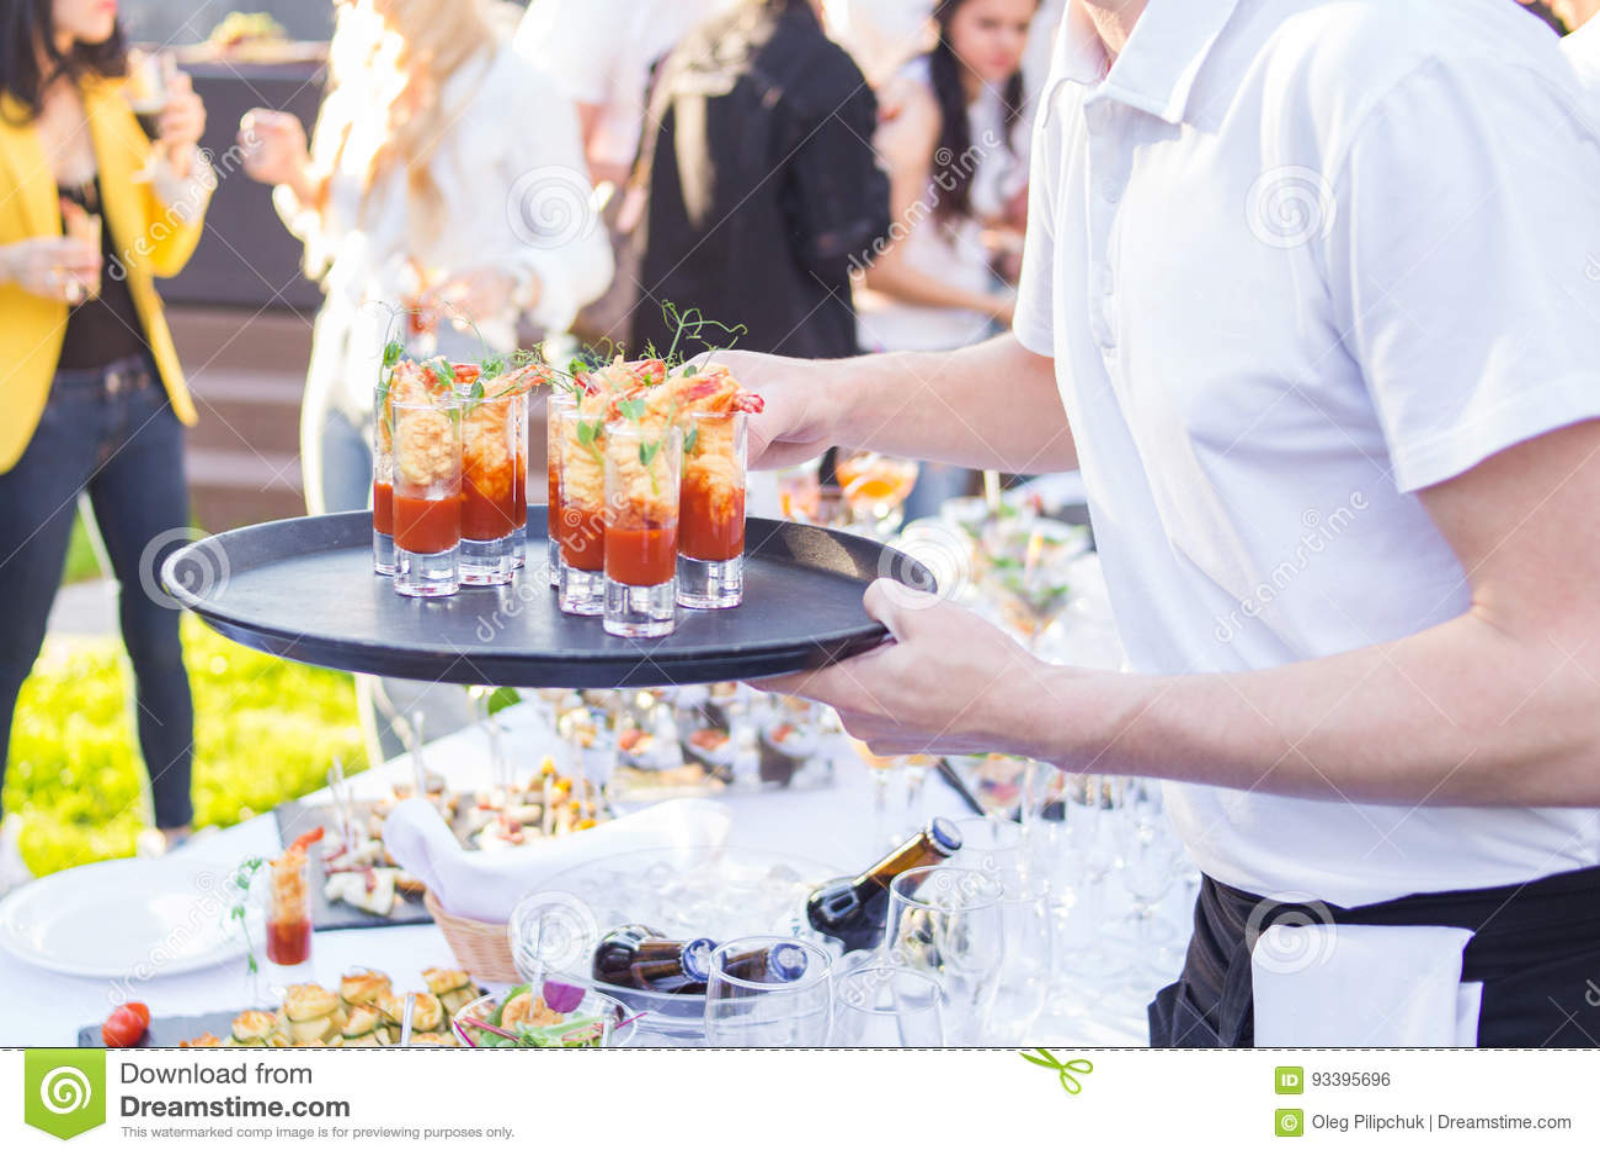 Catering jest outside na wydarzeniu